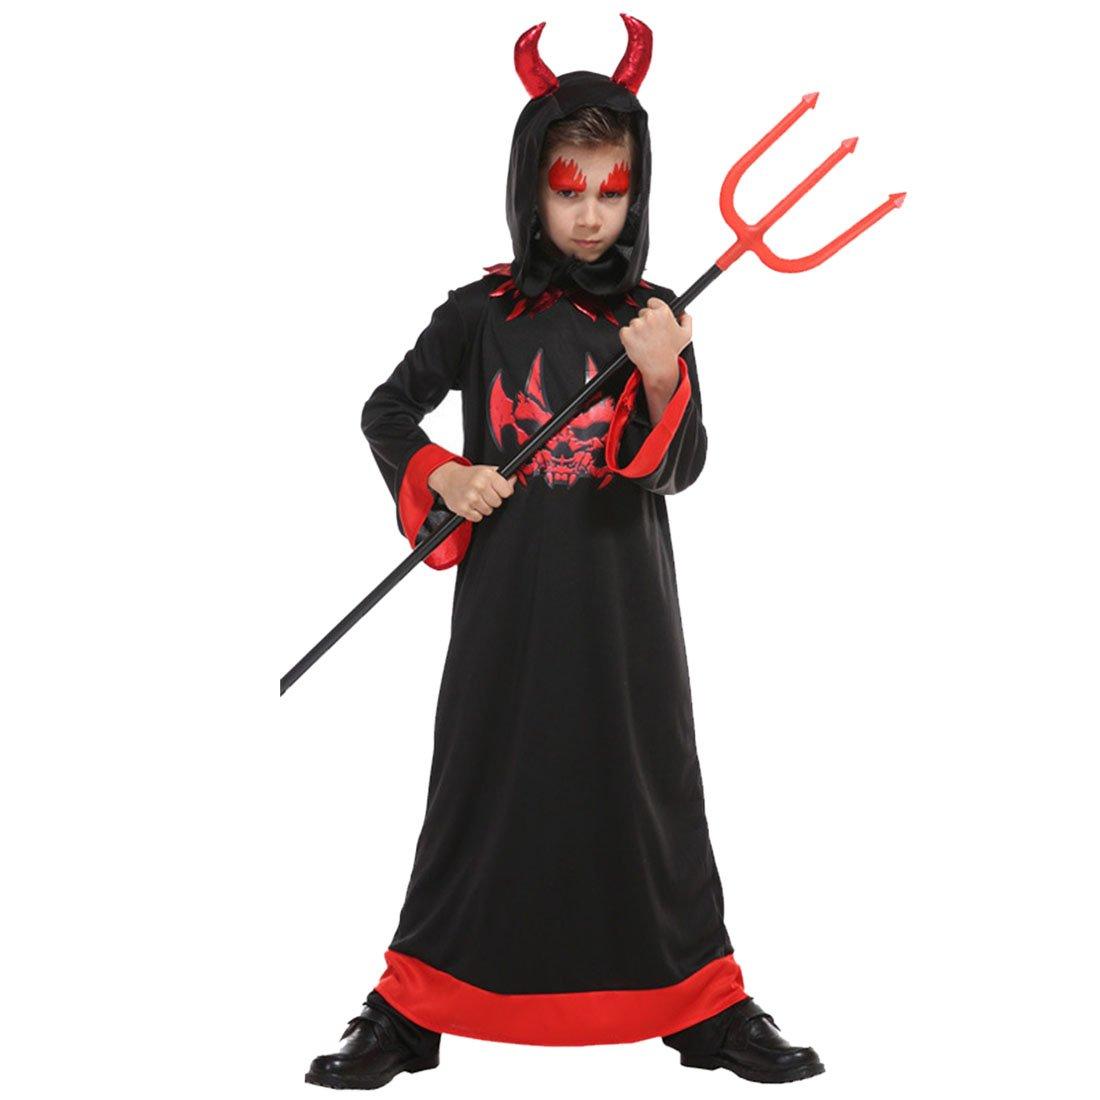 Jiyaru Halloween Kids Cloak Scary Vampire Costume Unisex Clothes Cosplay Party #6 S